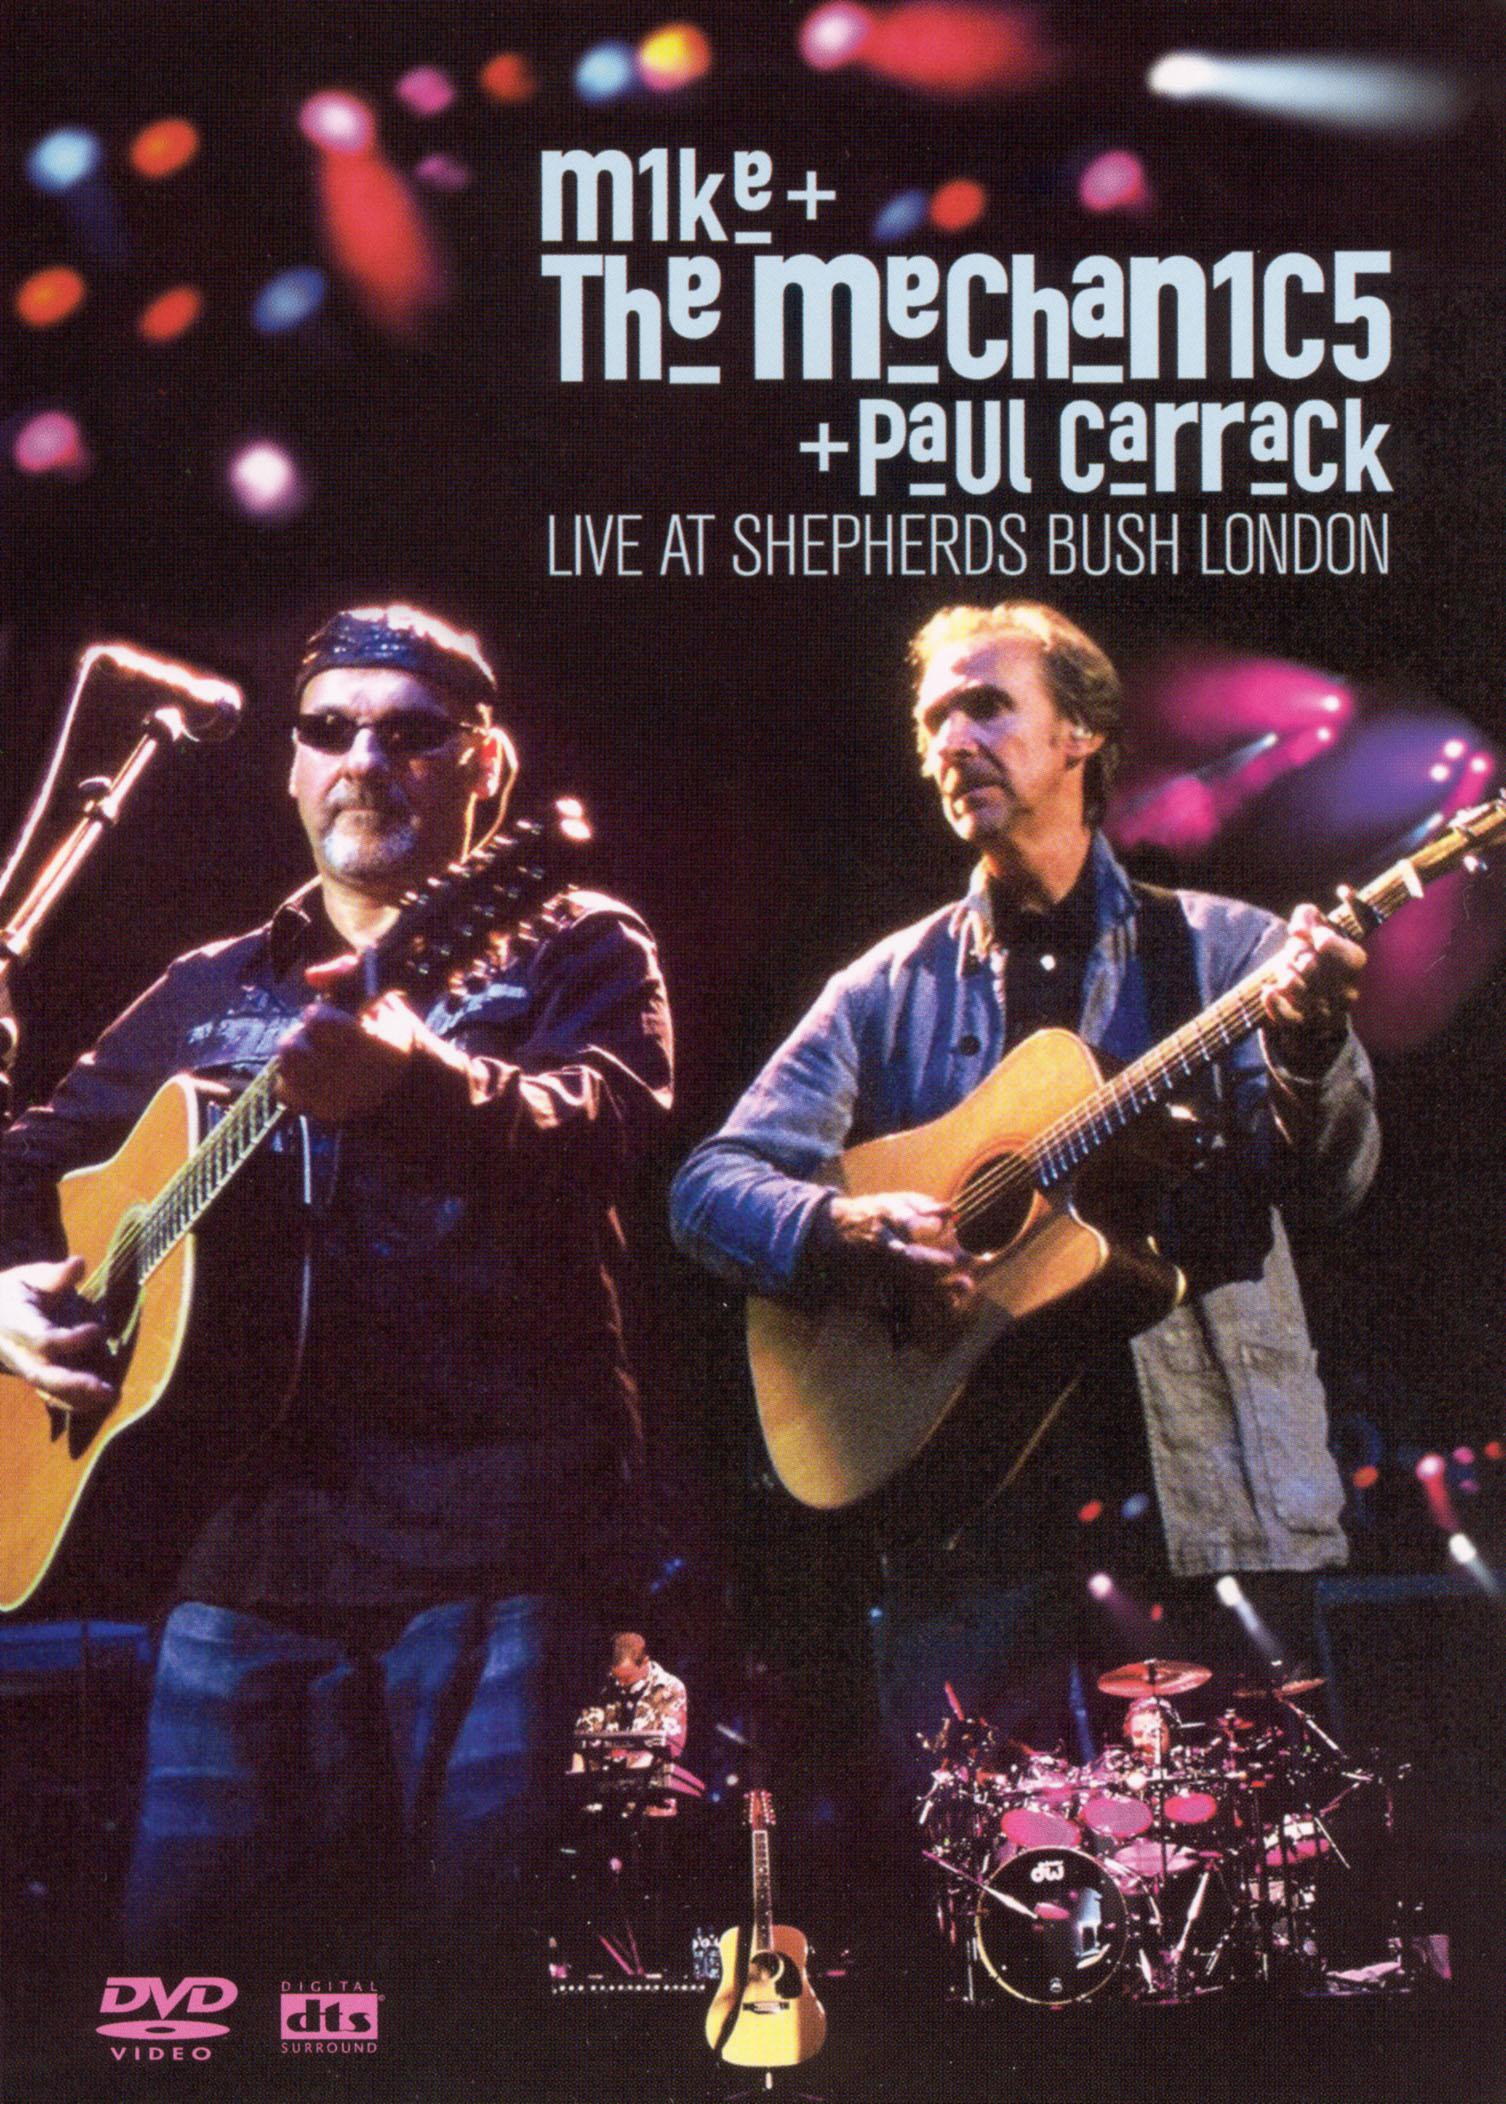 Mike + the Mechanics + Paul Carrack: Live at Shepherds Bush London